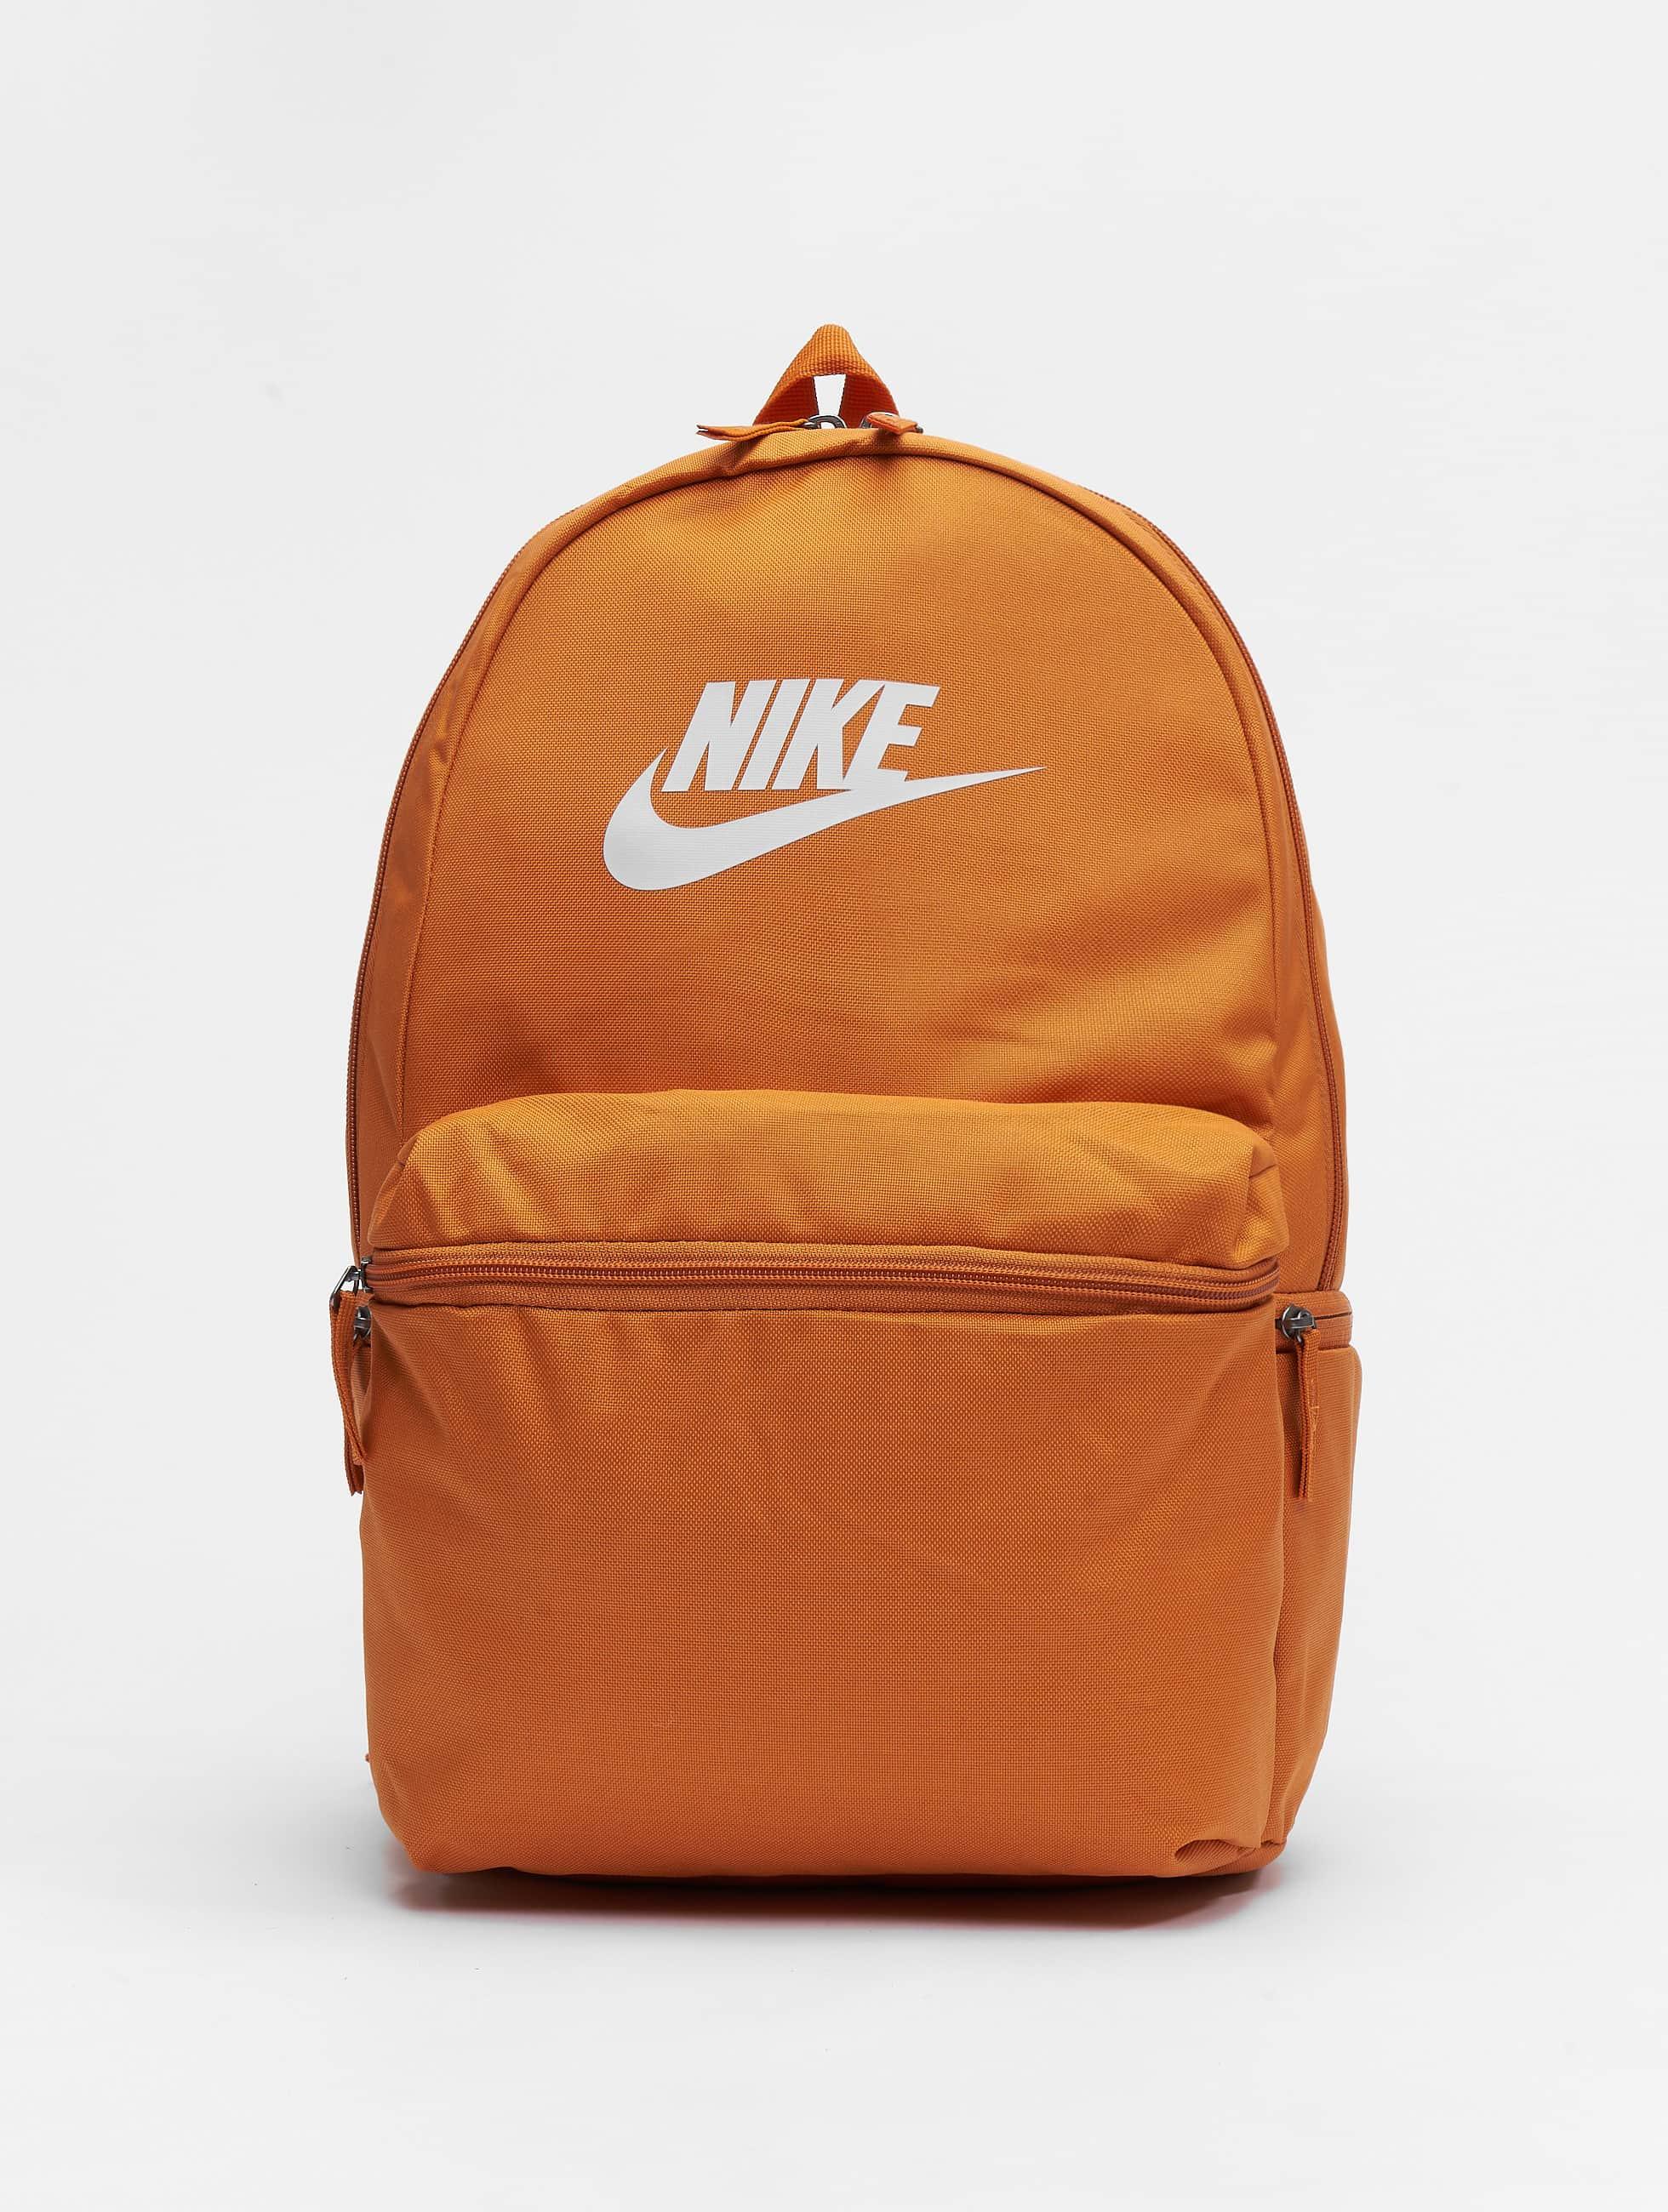 6b9b7a93453 Nike SB Accessoires / rugzak Heritage in oranje 669413